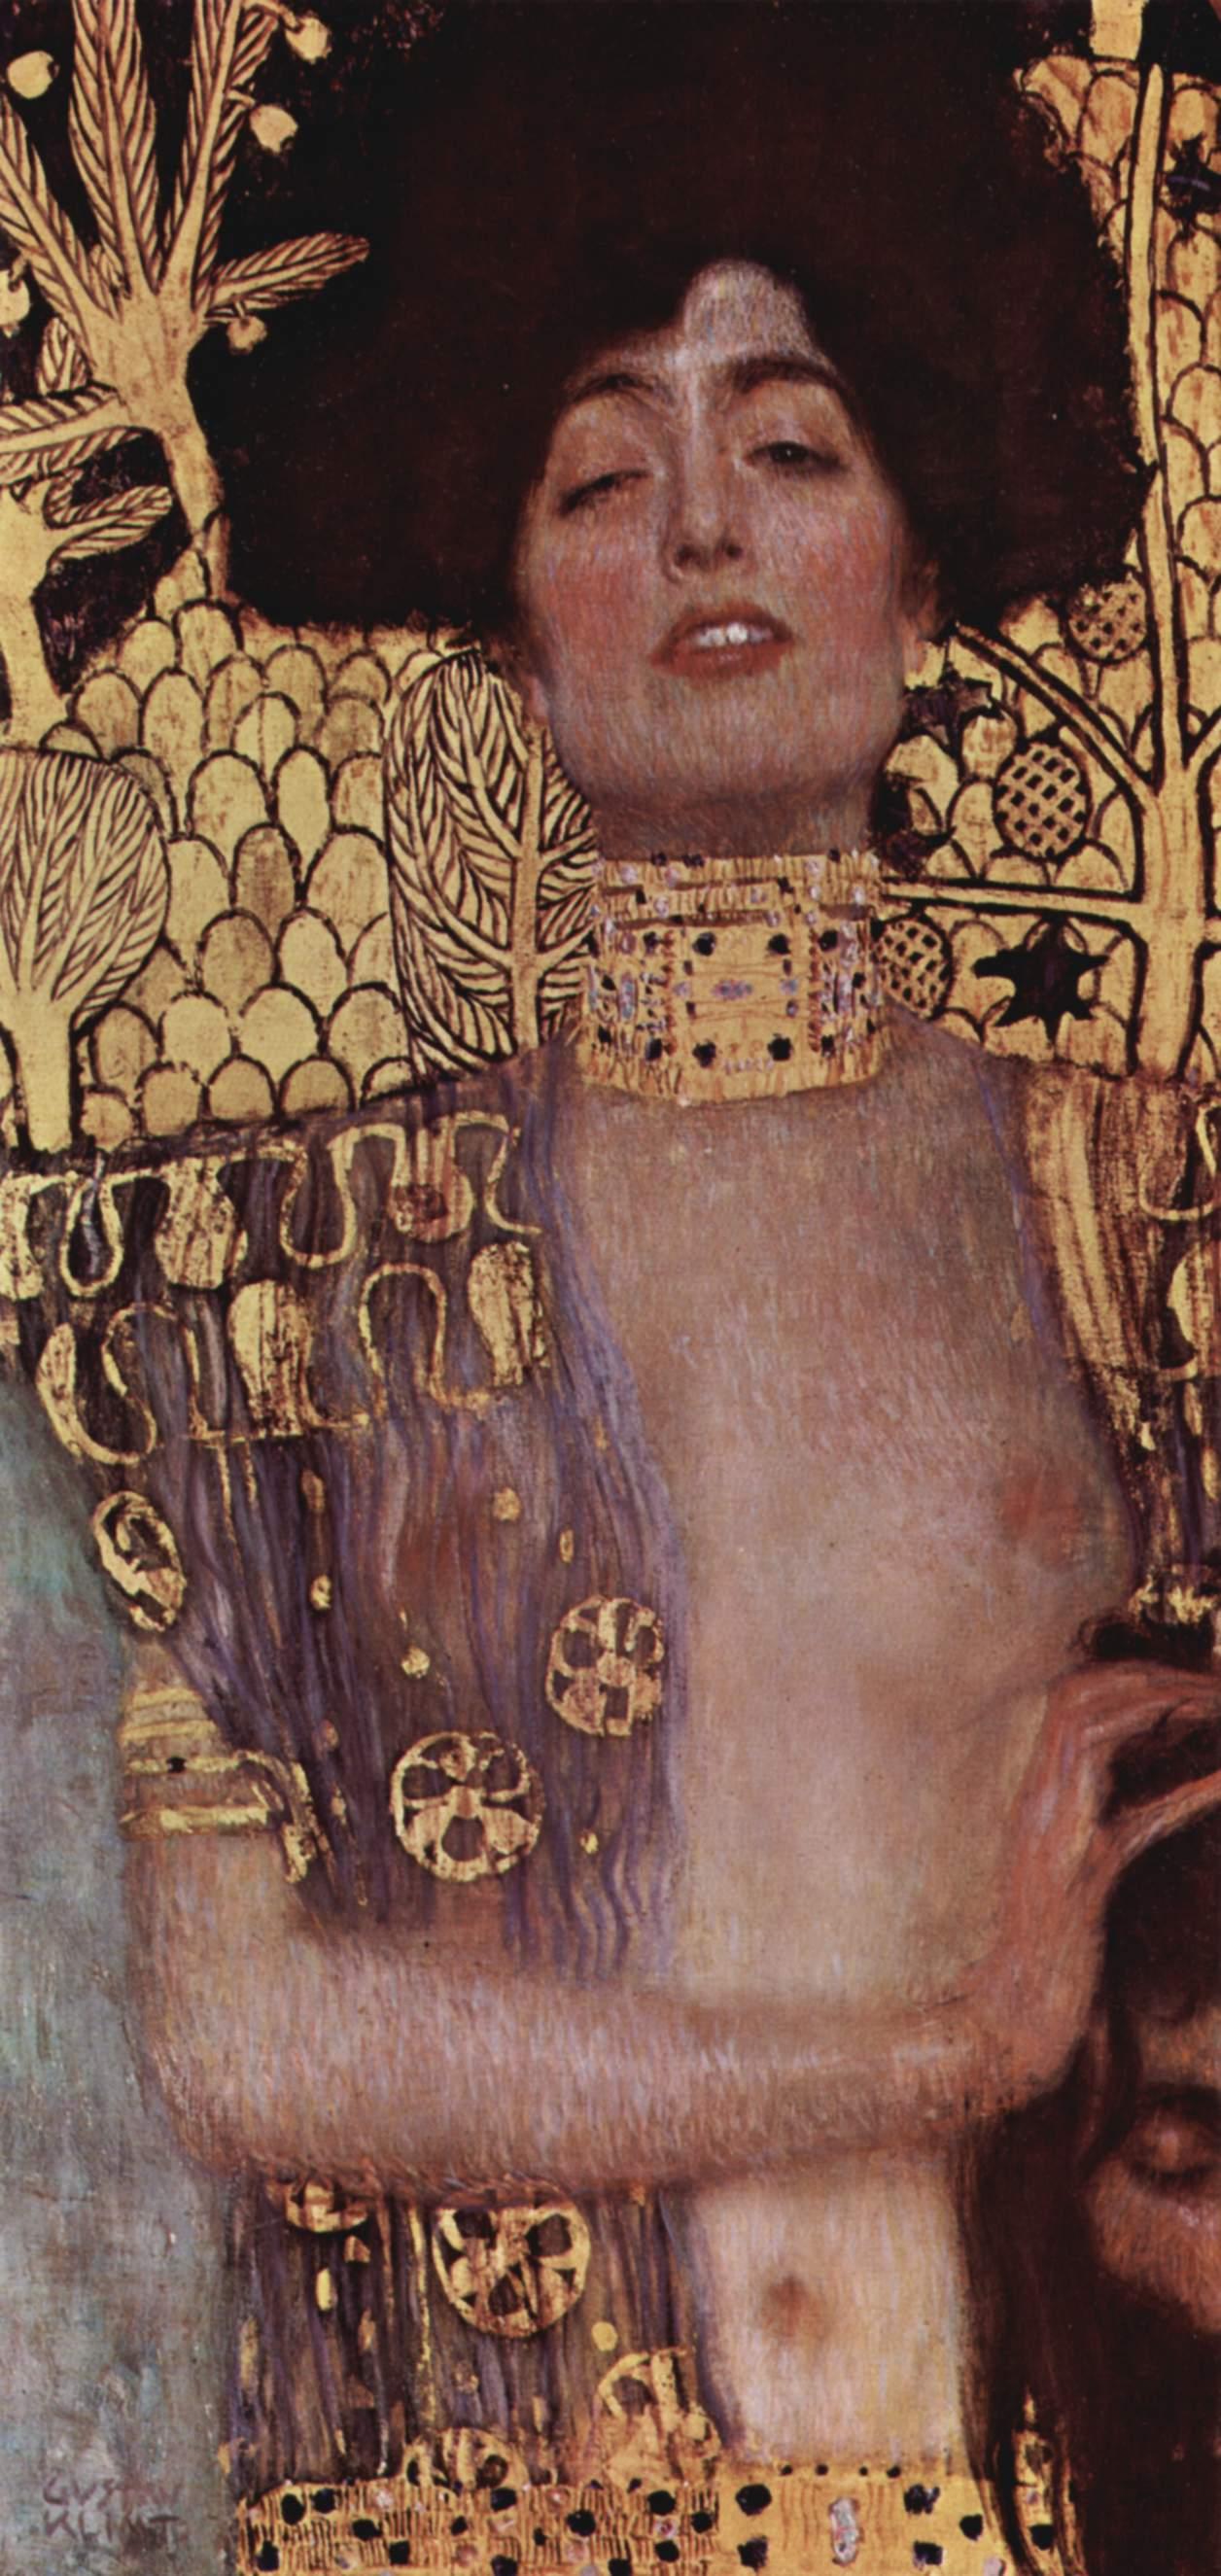 Gustav_Klimt_039.jpg (1256×2650)